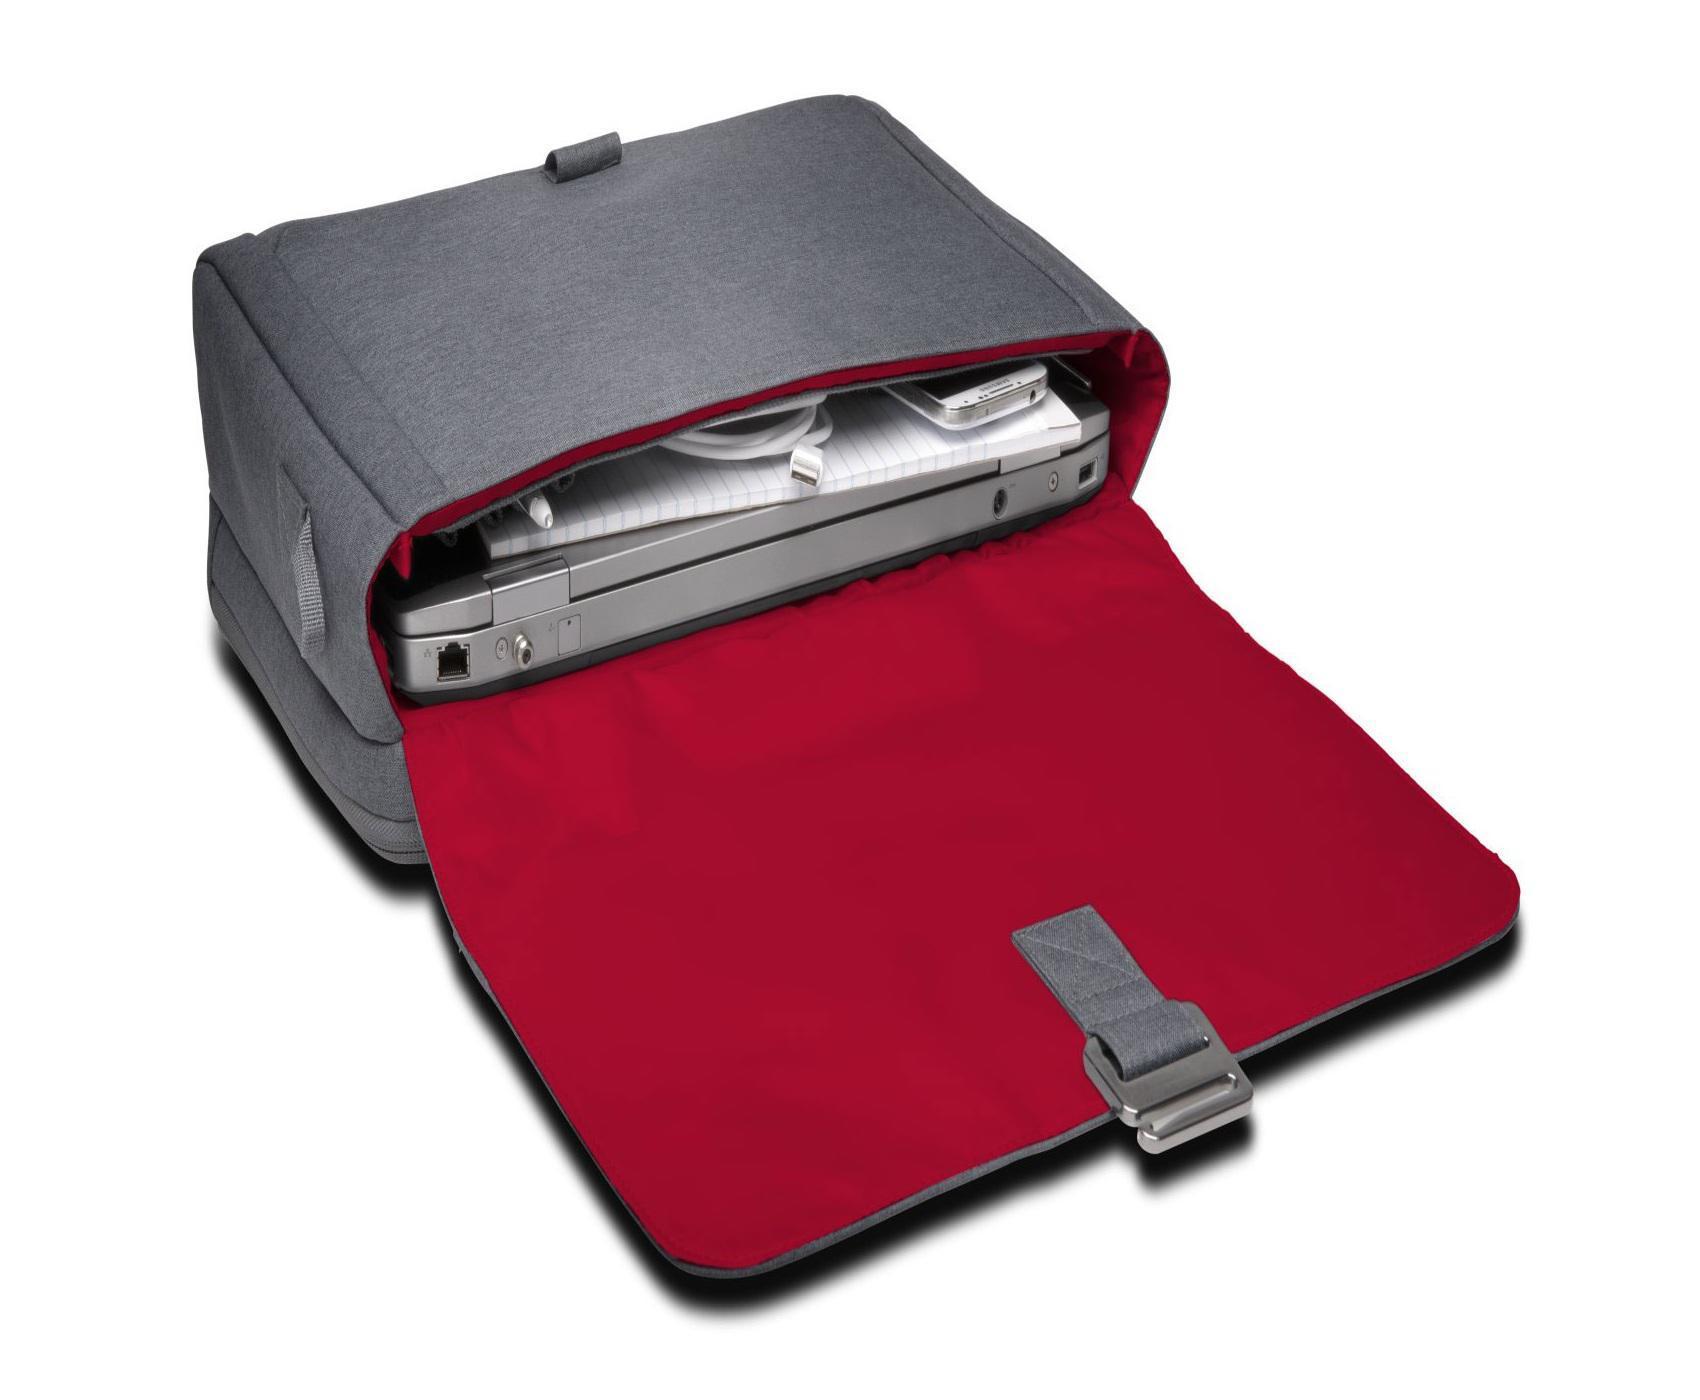 "Kensington 14.4"" Laptop Messenger Bag"